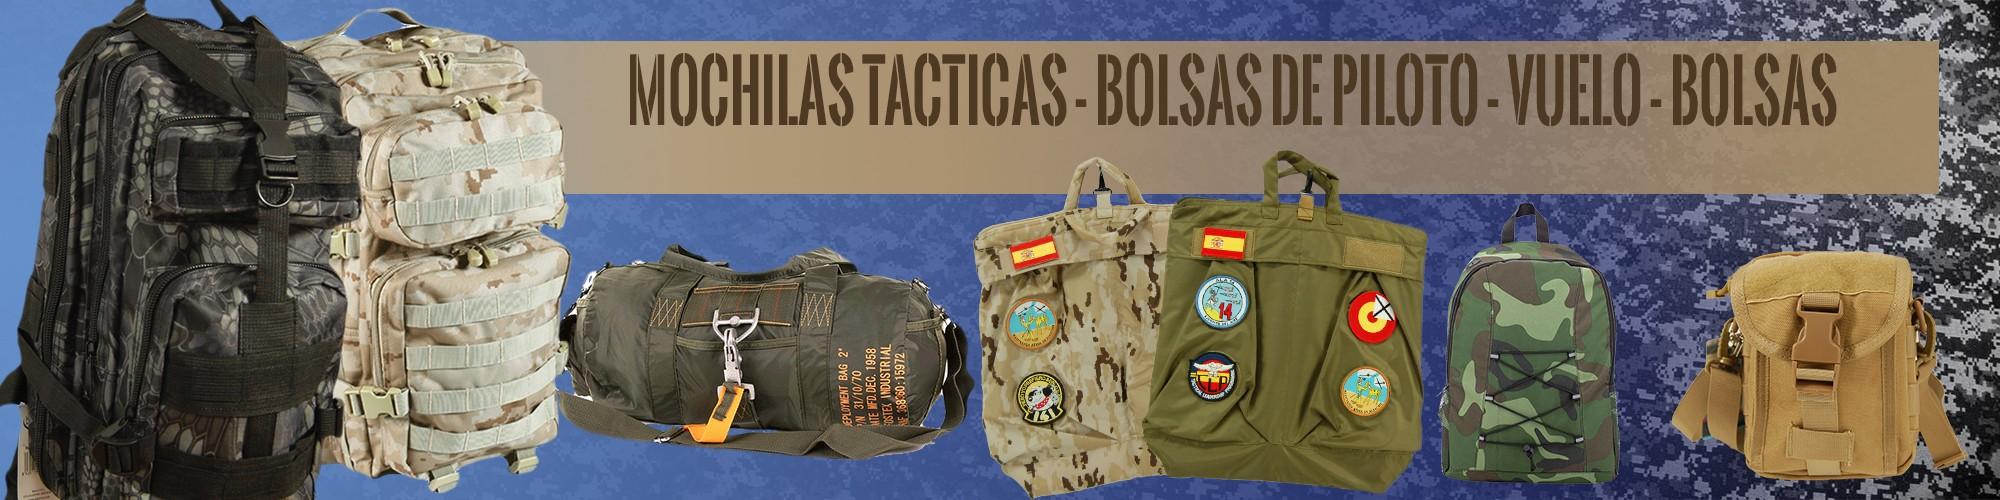 Mochilas tácticas - bolsas de piloto - bolsas de vuelo por estrella militar